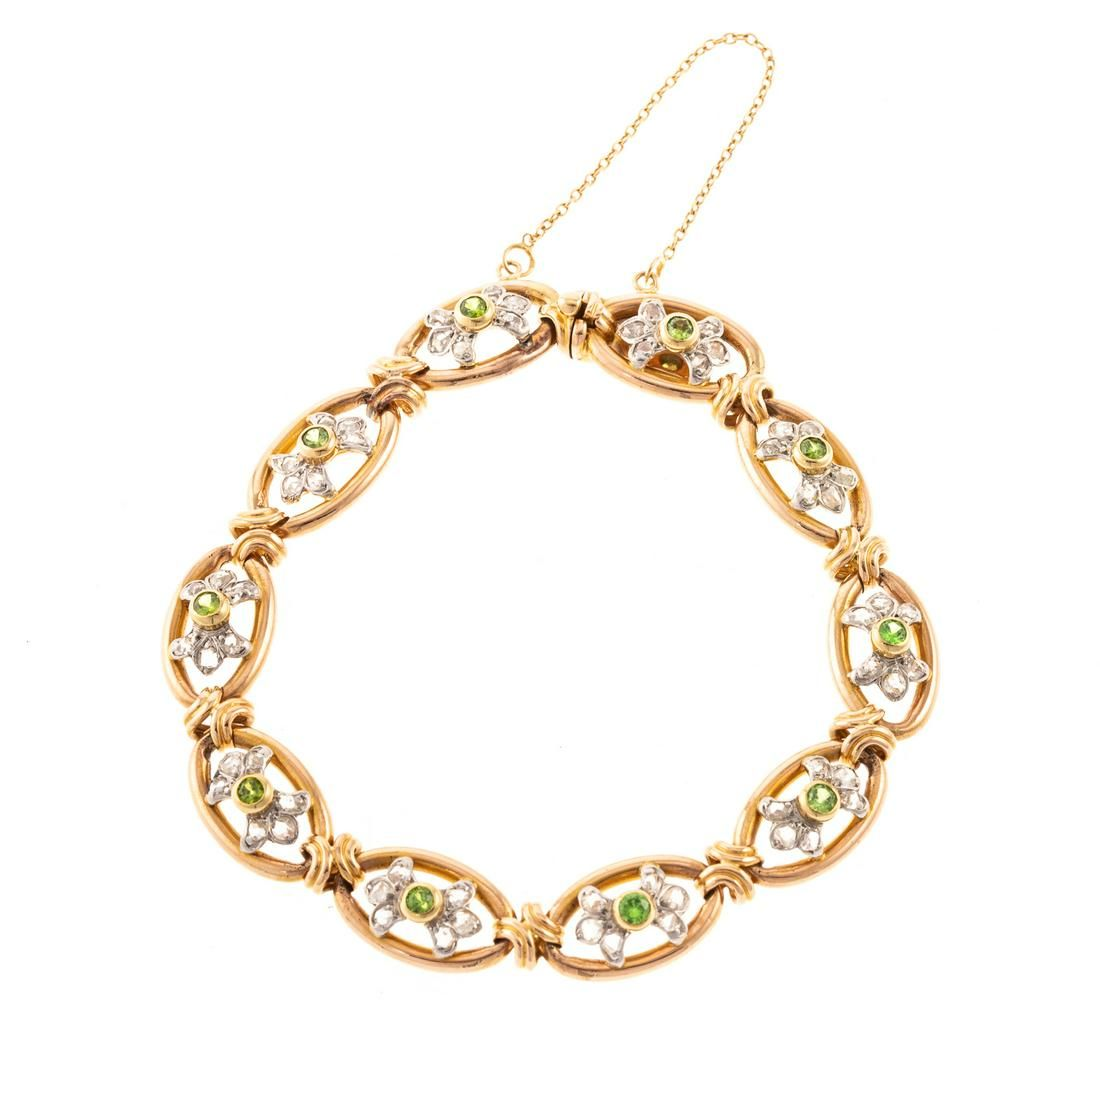 A French Demantoid Garnet & Diamond Bracelet